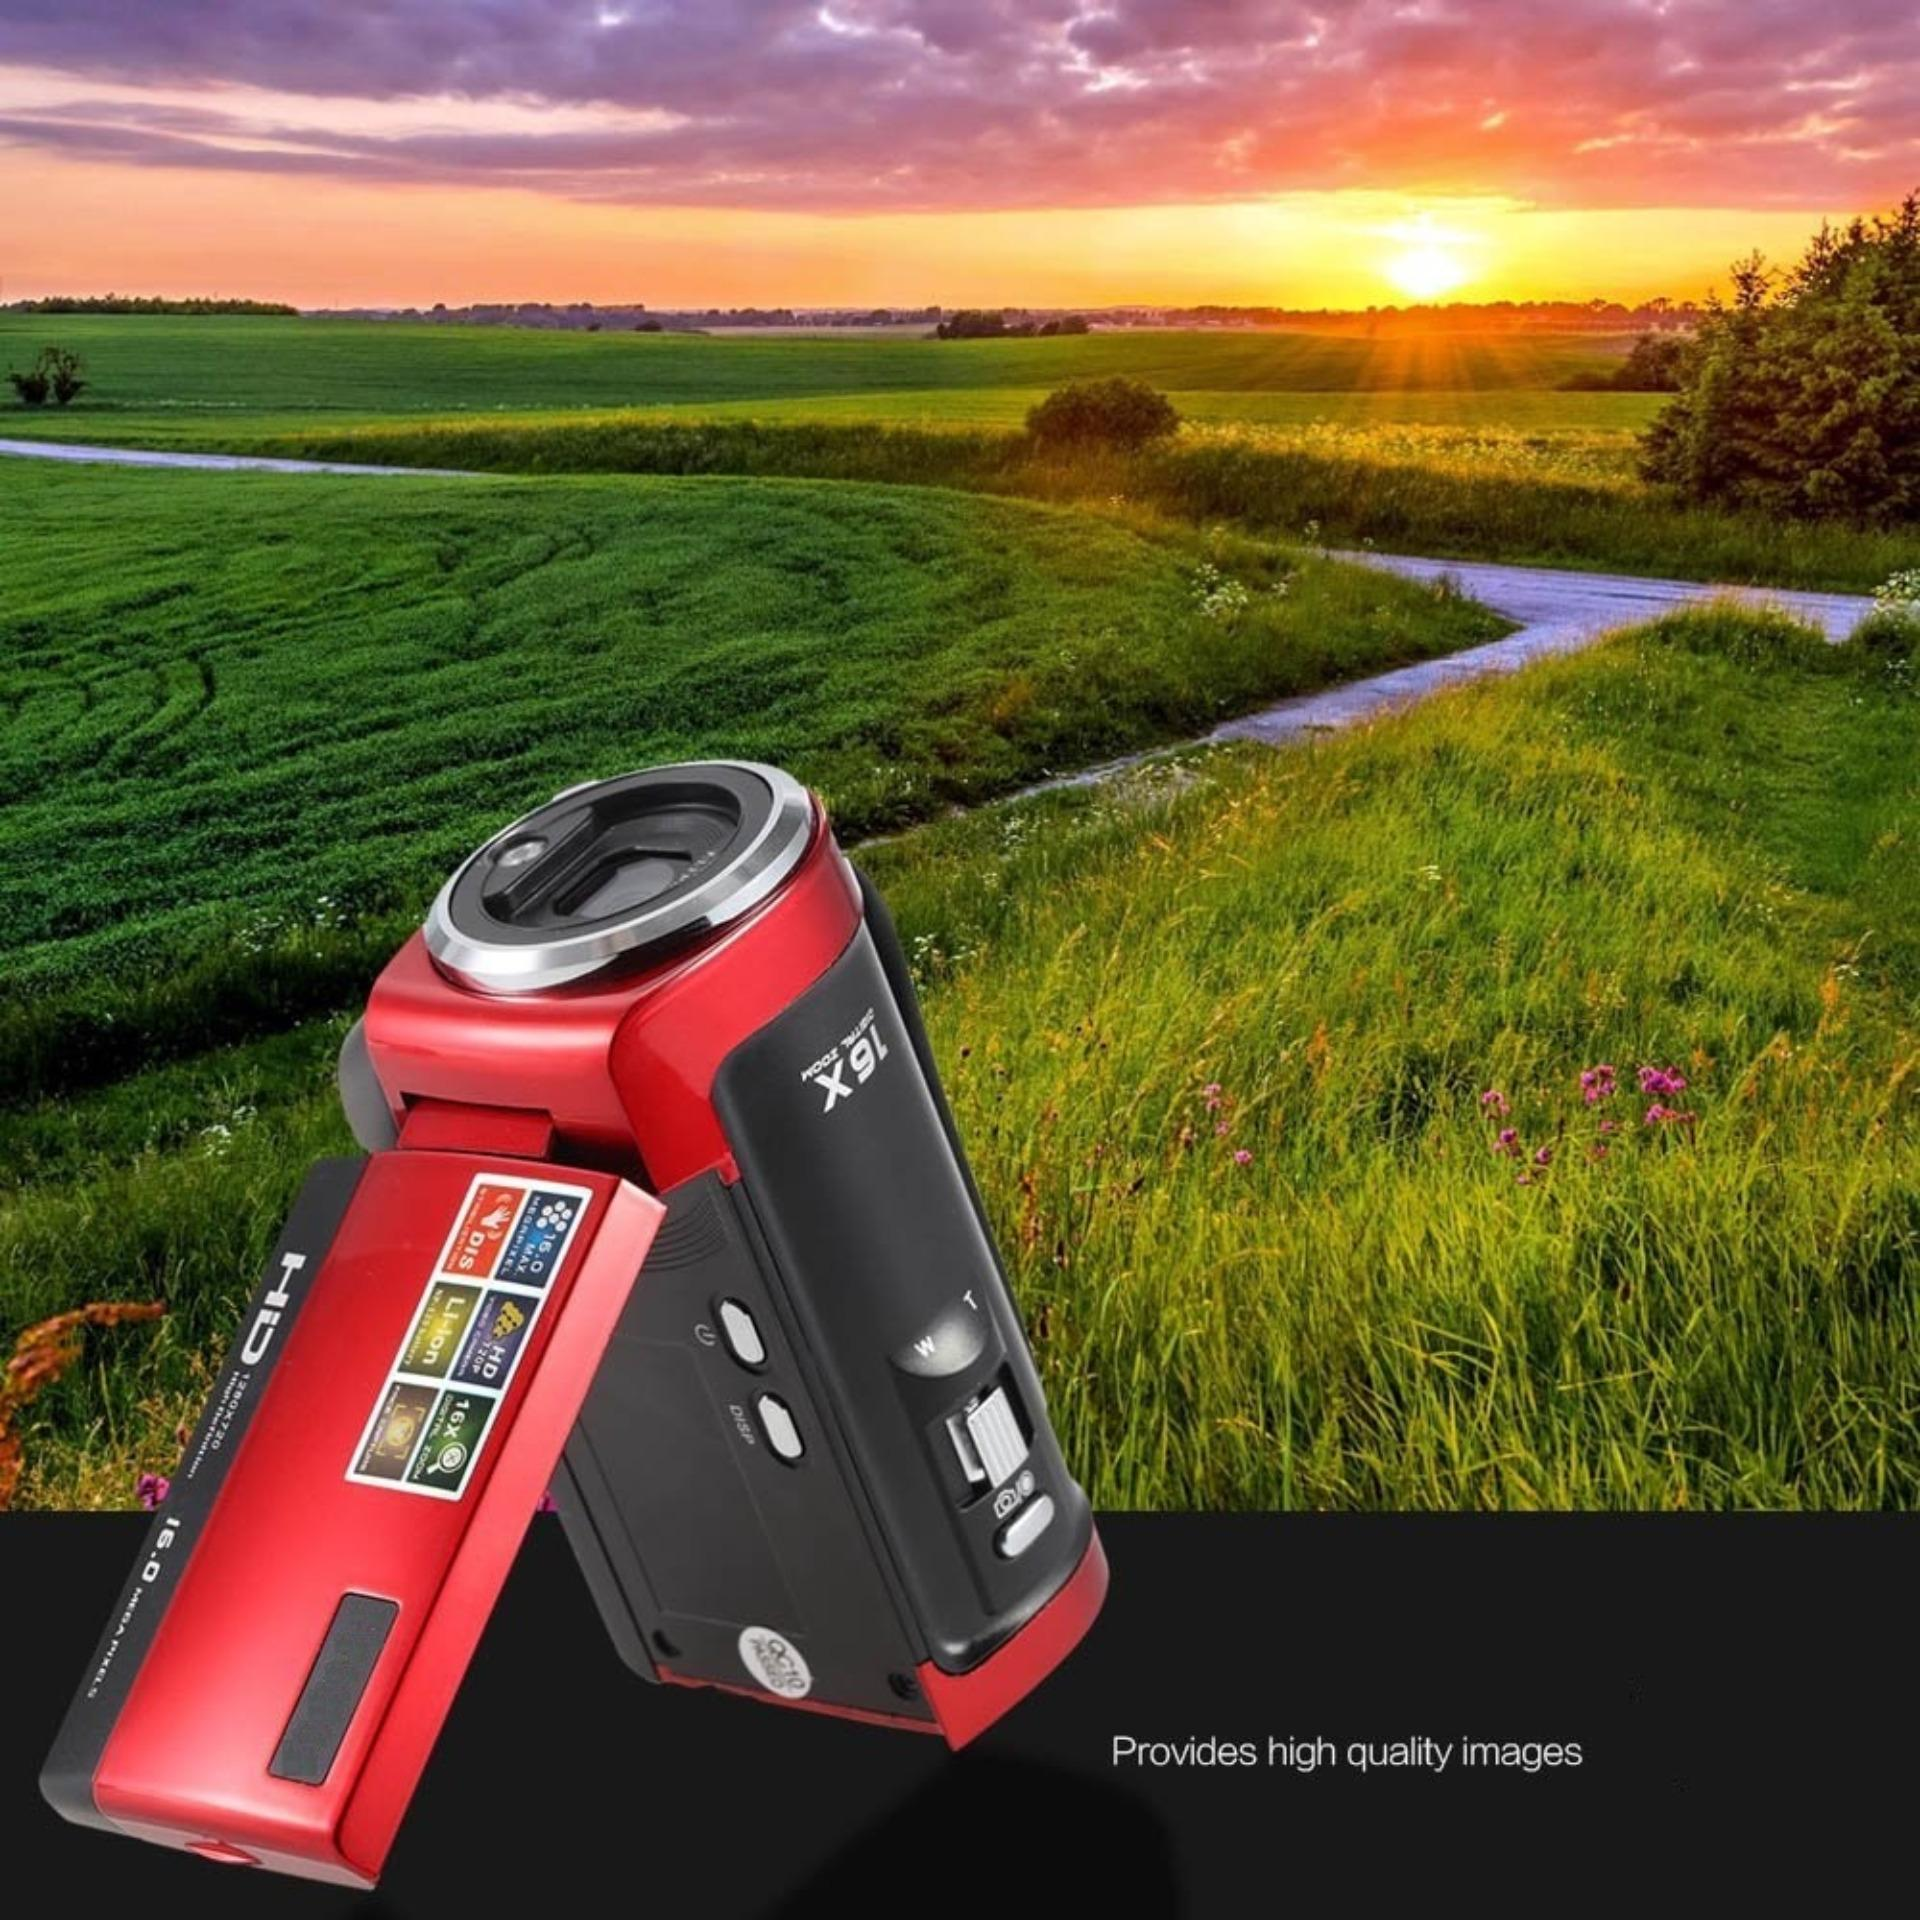 Giá KM Máy Quay Phim Cầm Tay ELITEK HD Digital Video 16X